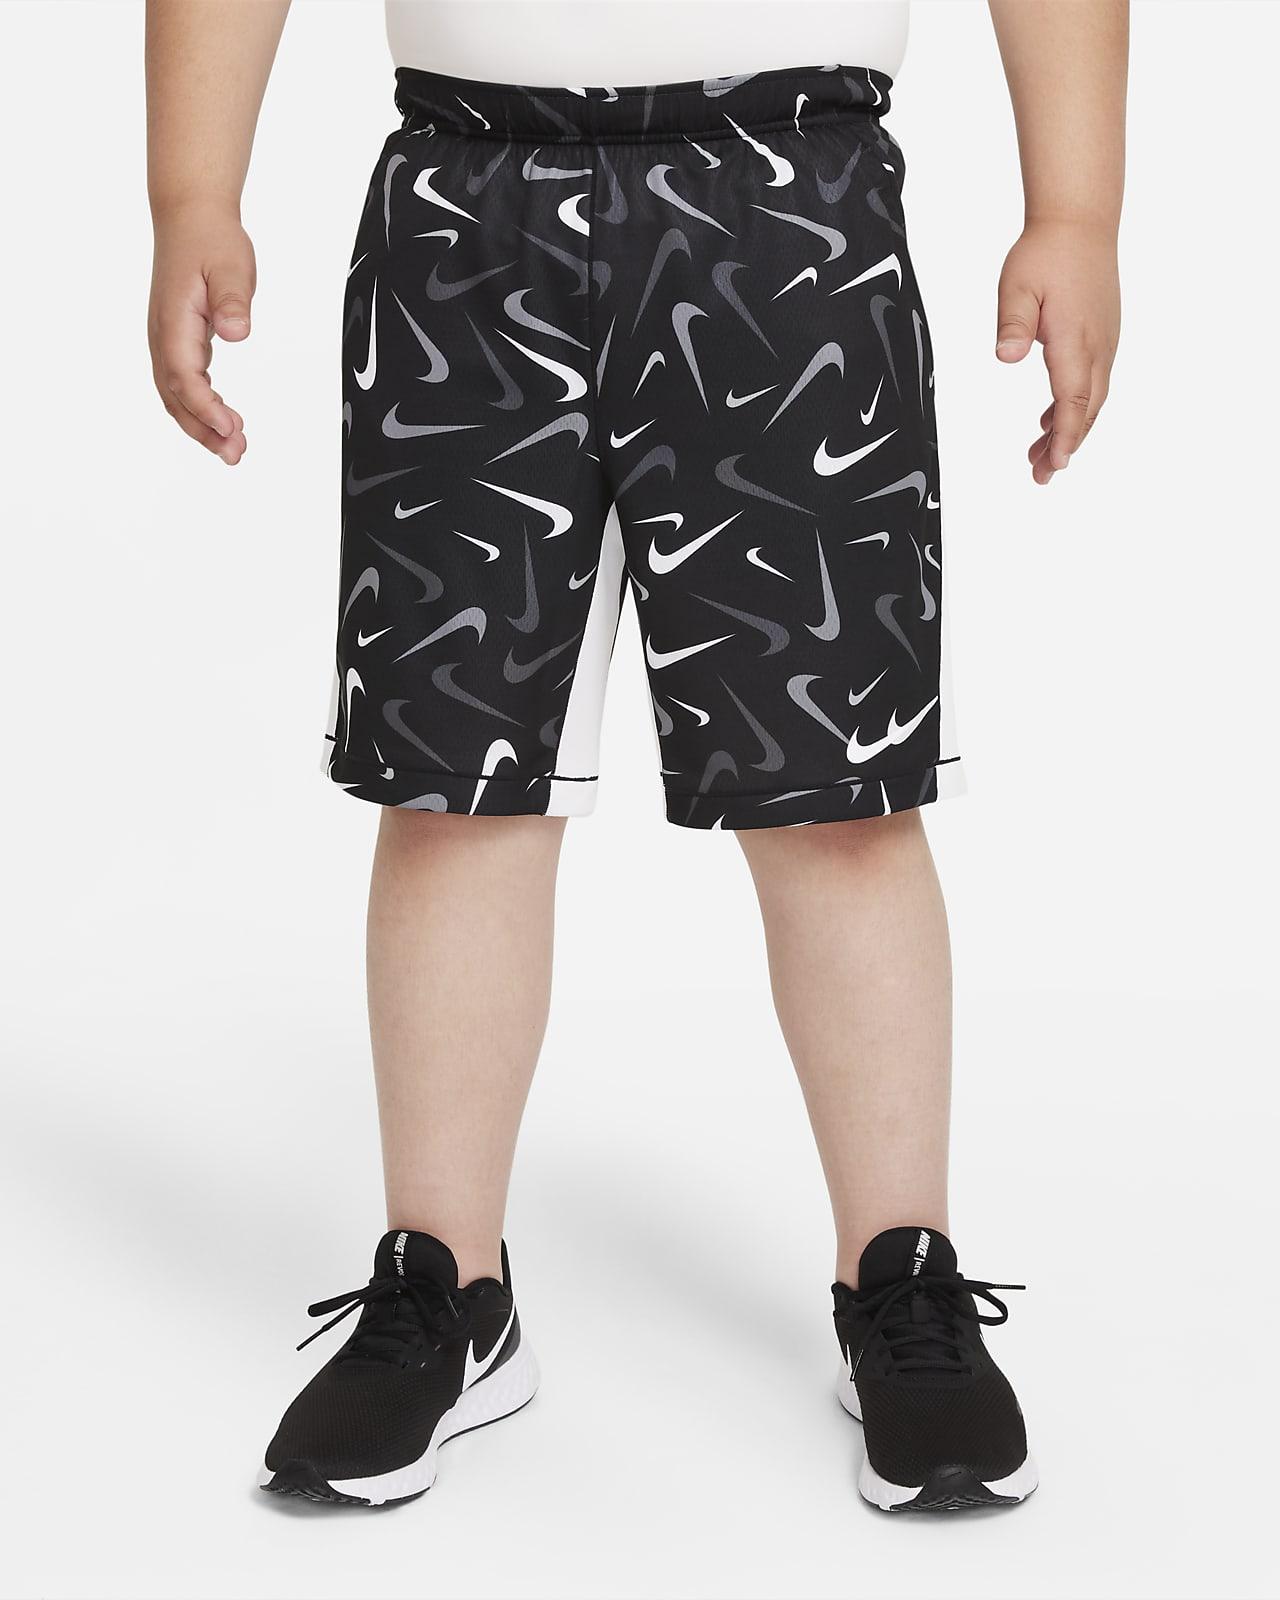 Nike Dri-FIT Trainingsshorts voor jongens (ruimere maten)